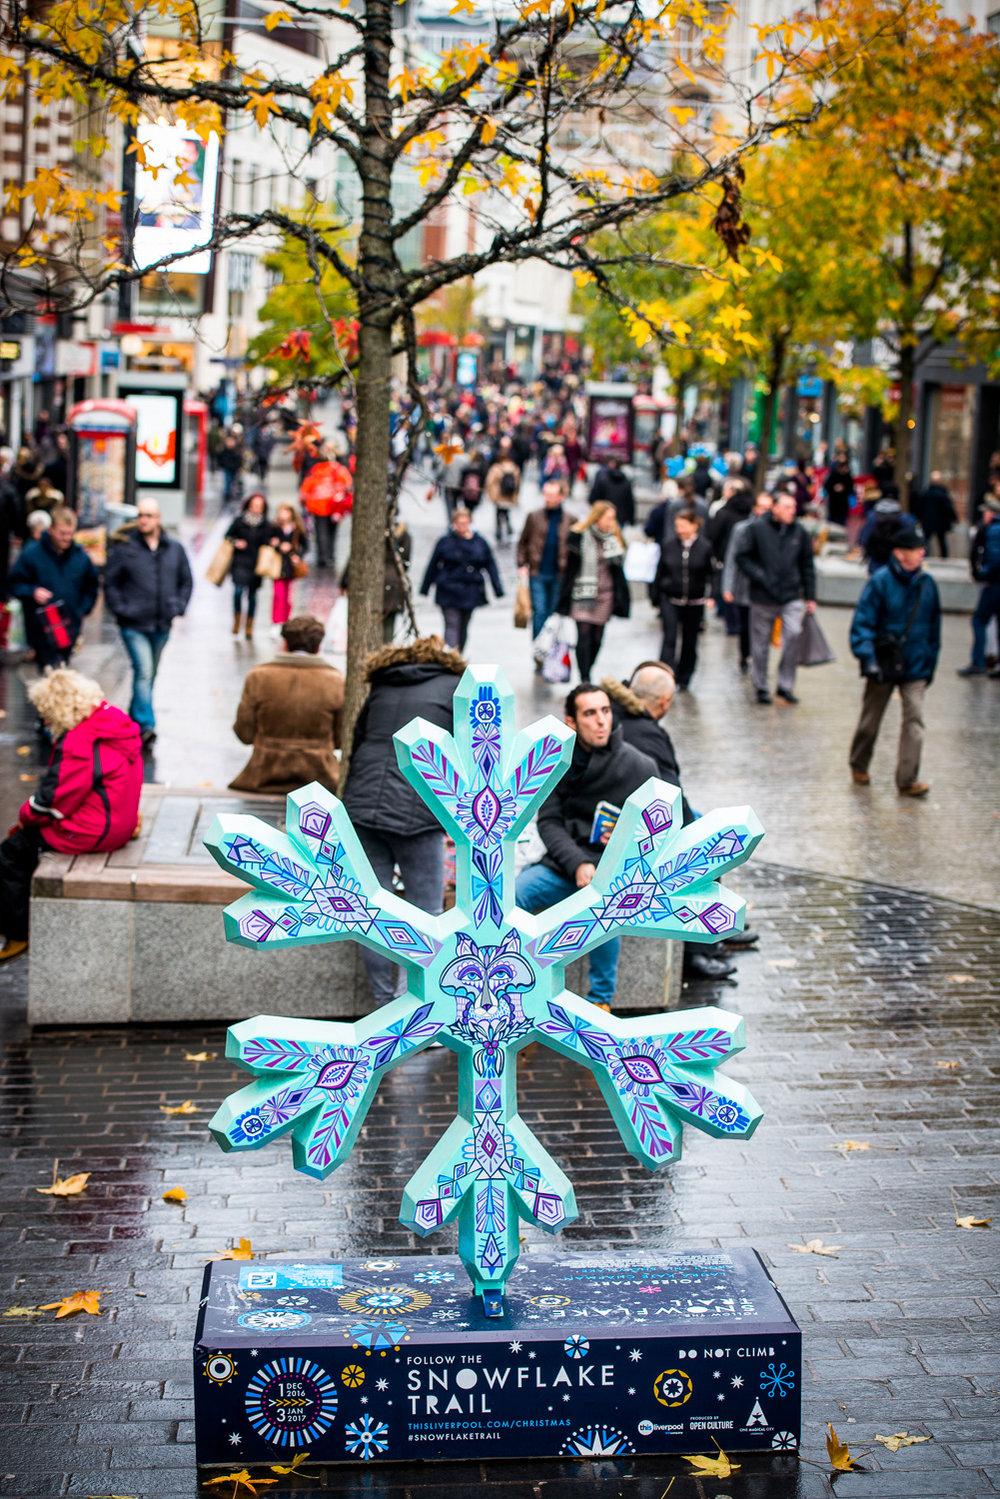 liverpool_snowflake_trail-15.jpg